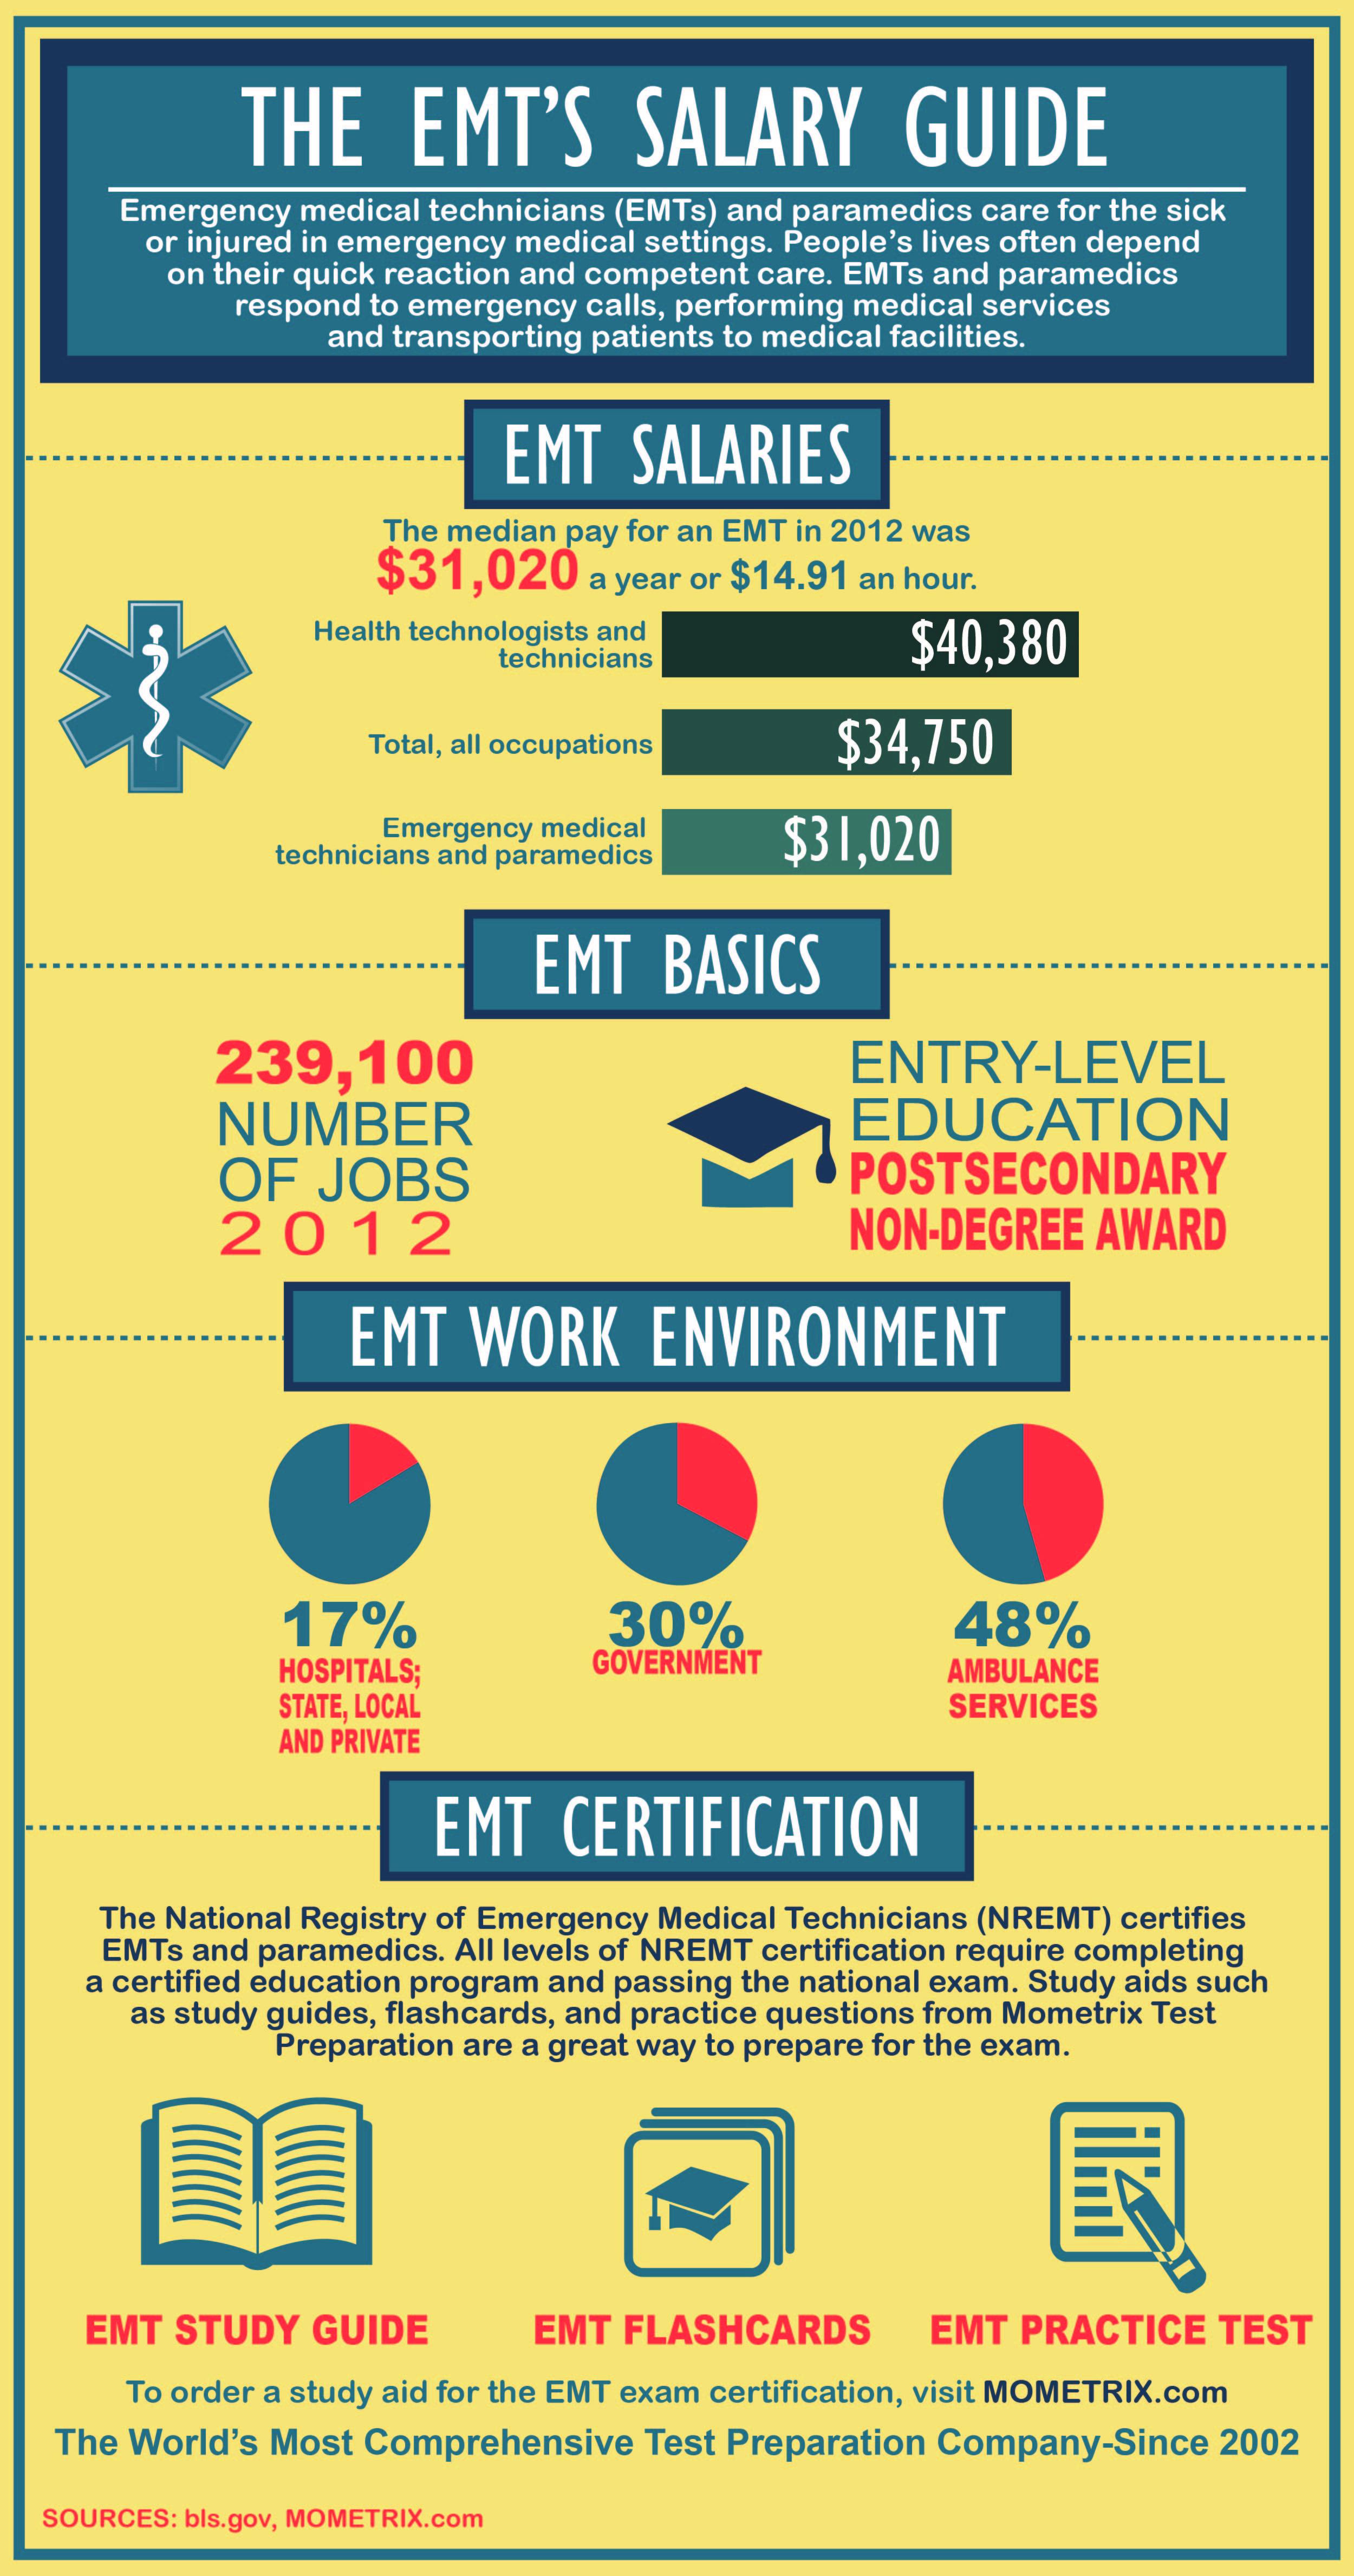 emt study guide pdf - Dolap.magnetband.co